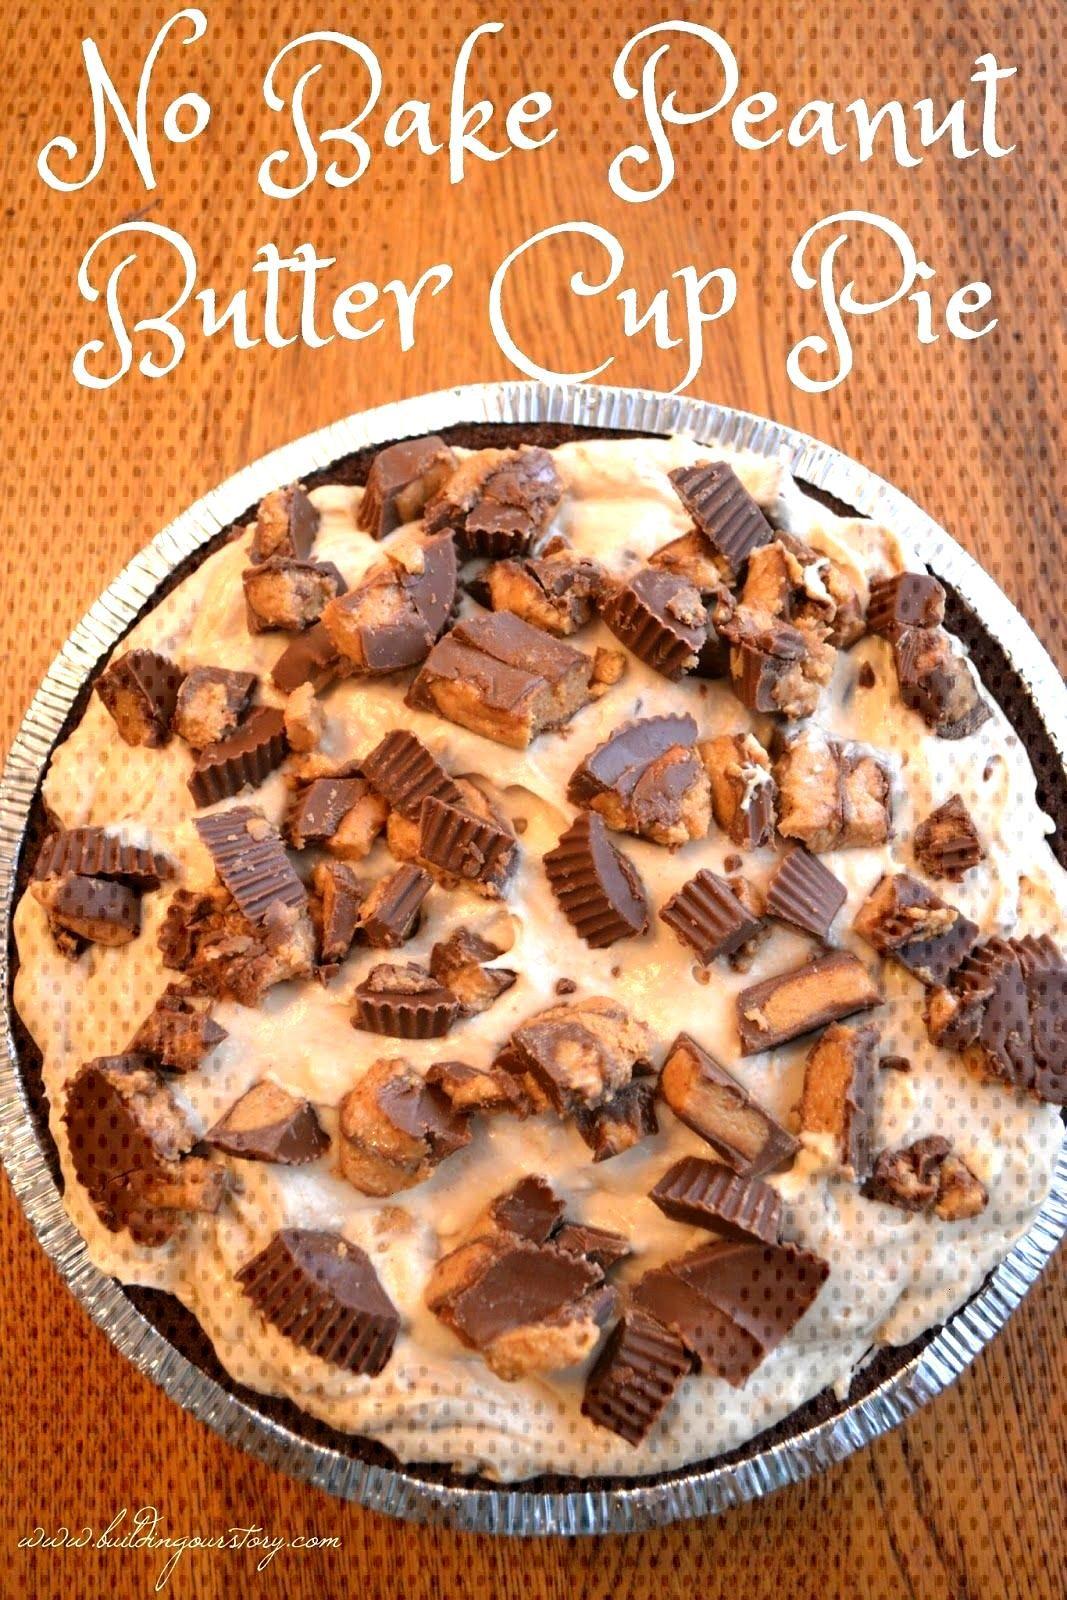 No Bake Peanut Butter Cup Pie, no bake pies, No Bake Peanut Butter Cup Pie…No Bake Peanut Butter